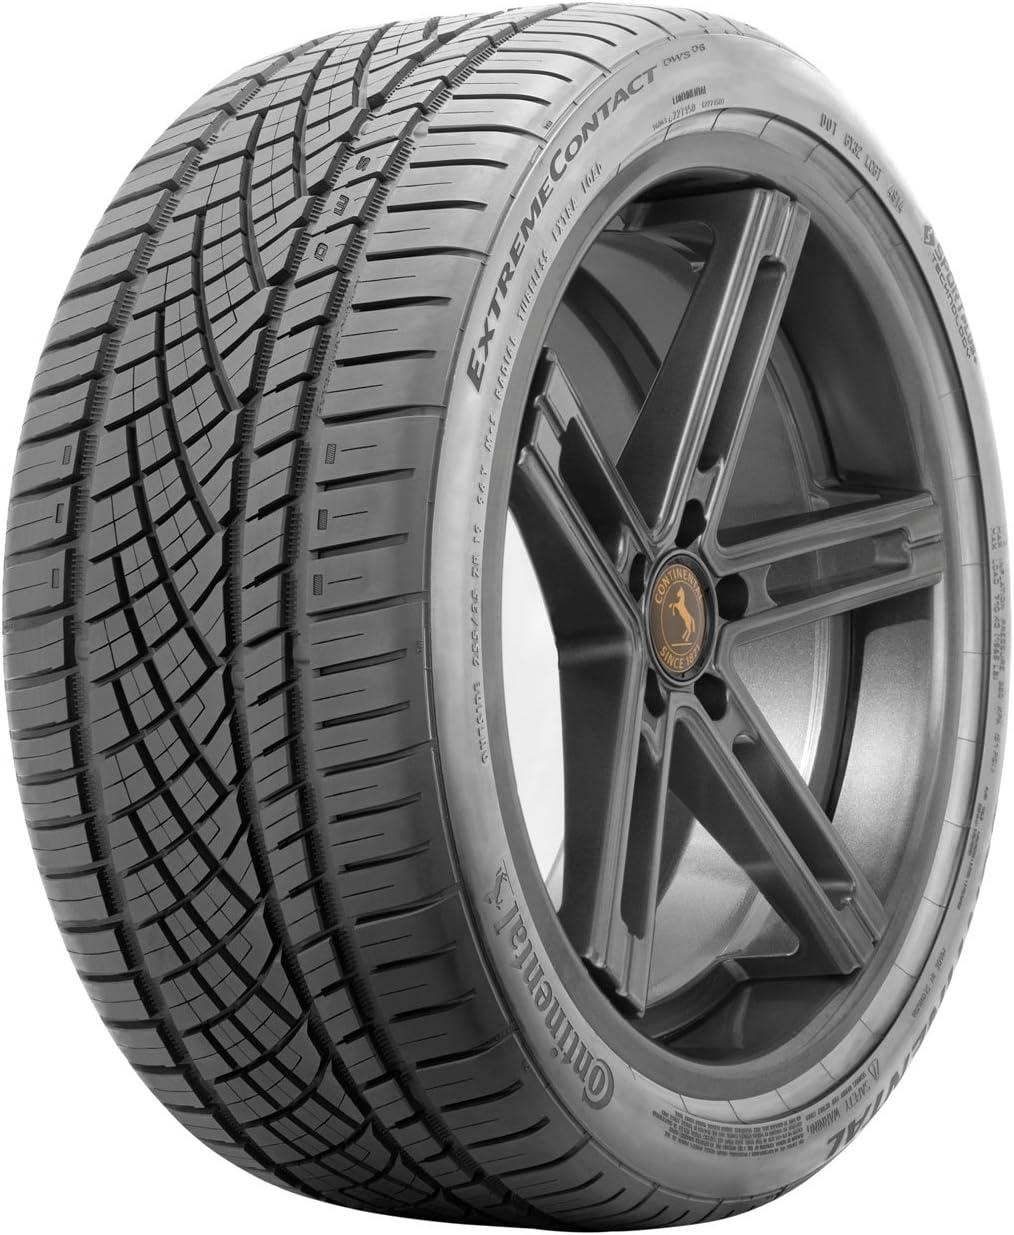 Continental Washington Mall Extreme Contact DWS06 All-Season 4 265 Radial 25% OFF Tire -